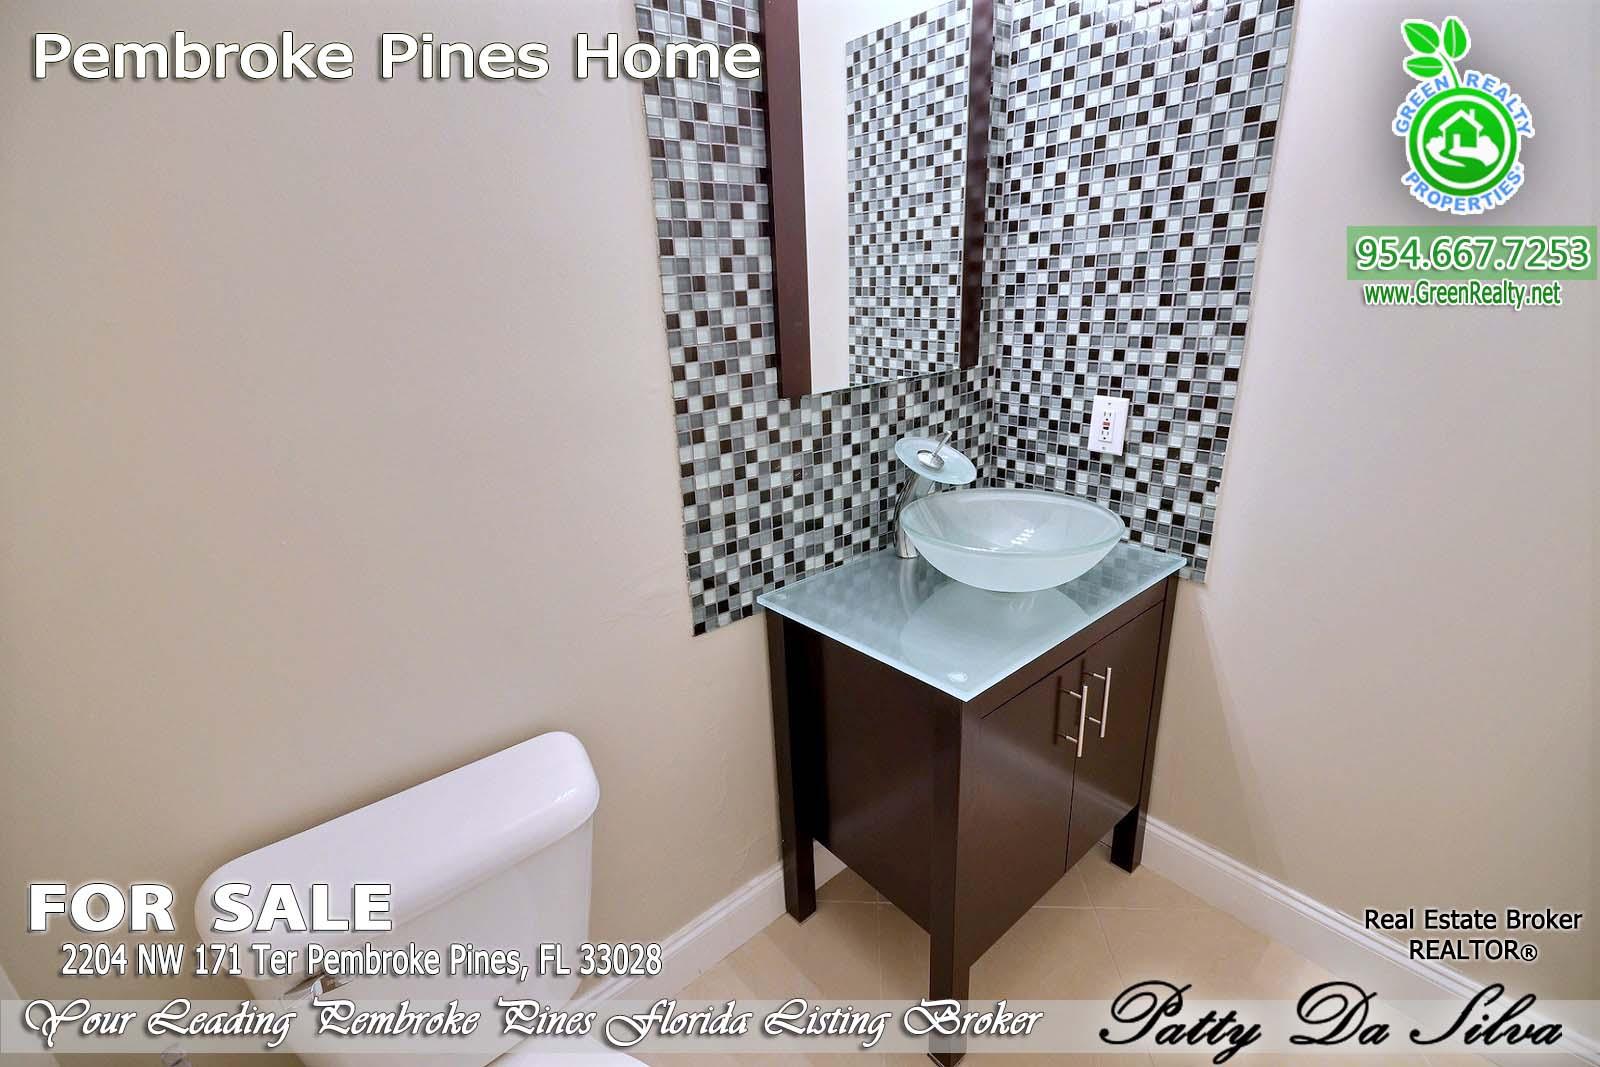 Pembroke Pines Homes For Sale - Pembroke Isles (5)